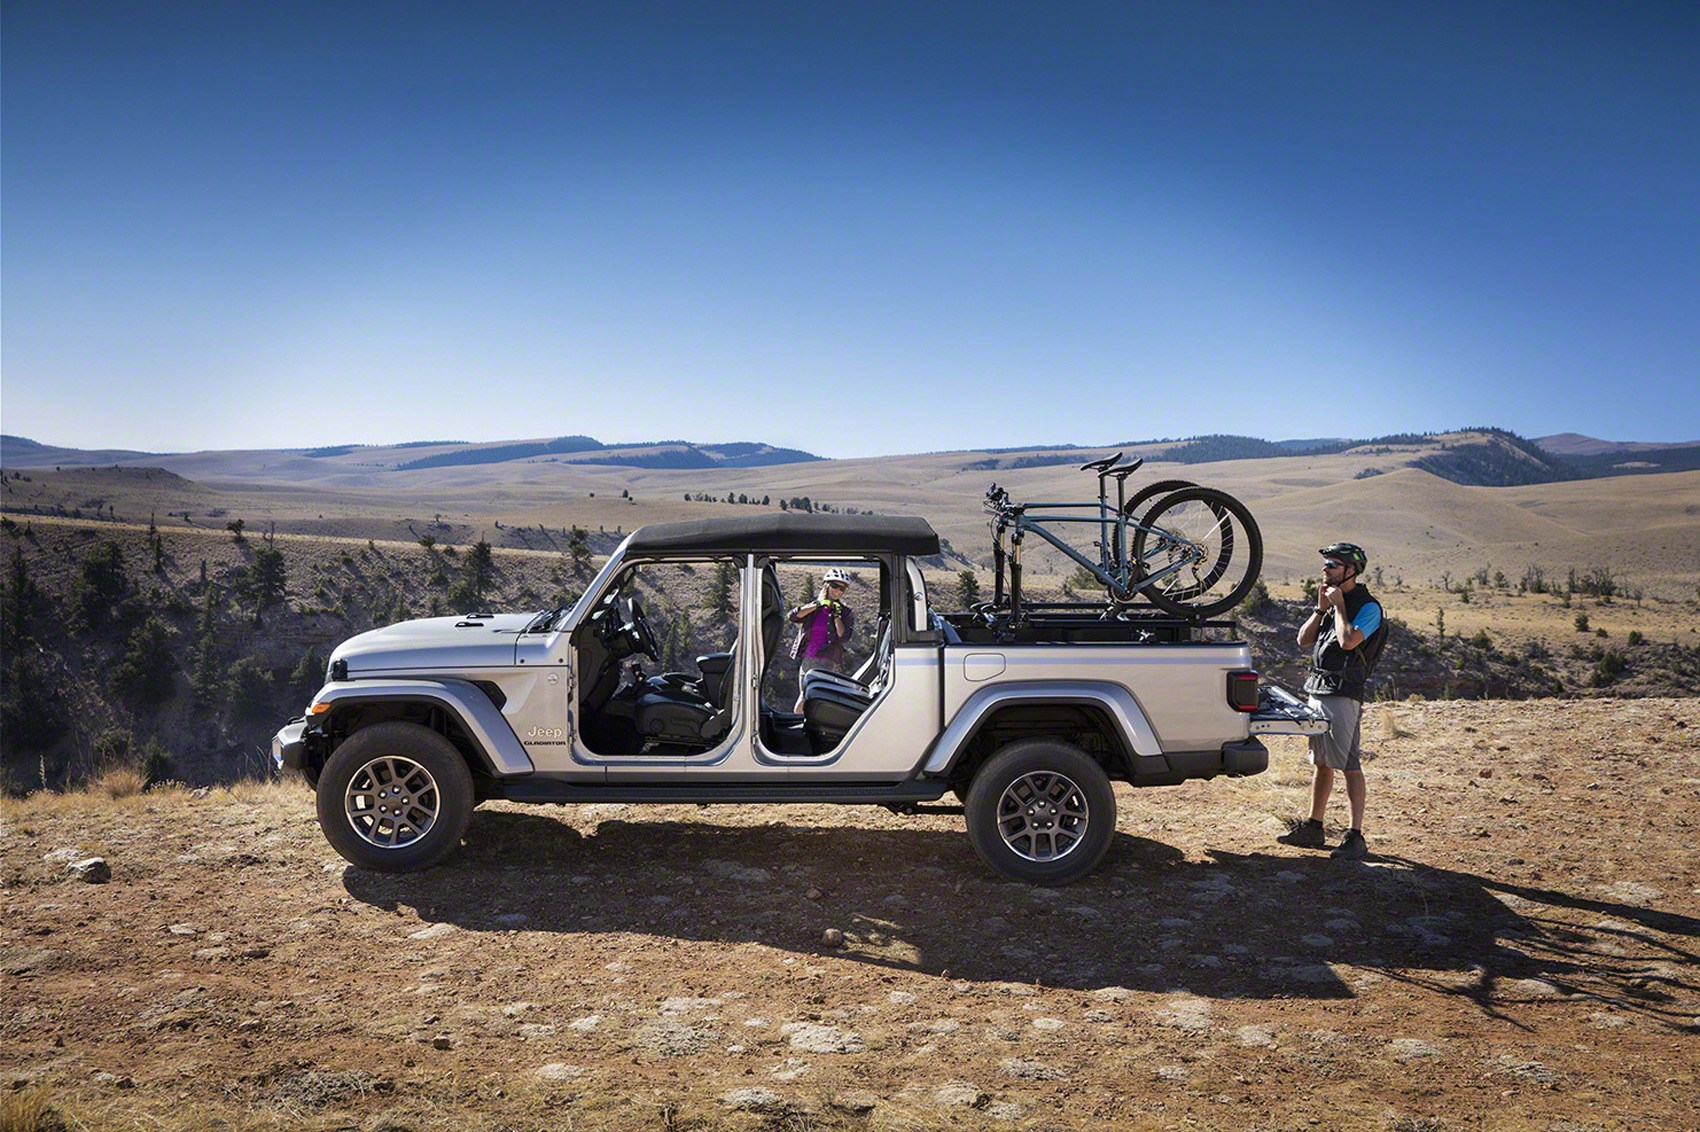 Gladiator, ready! New 2020 Jeep Gladiator pickup arrives ...